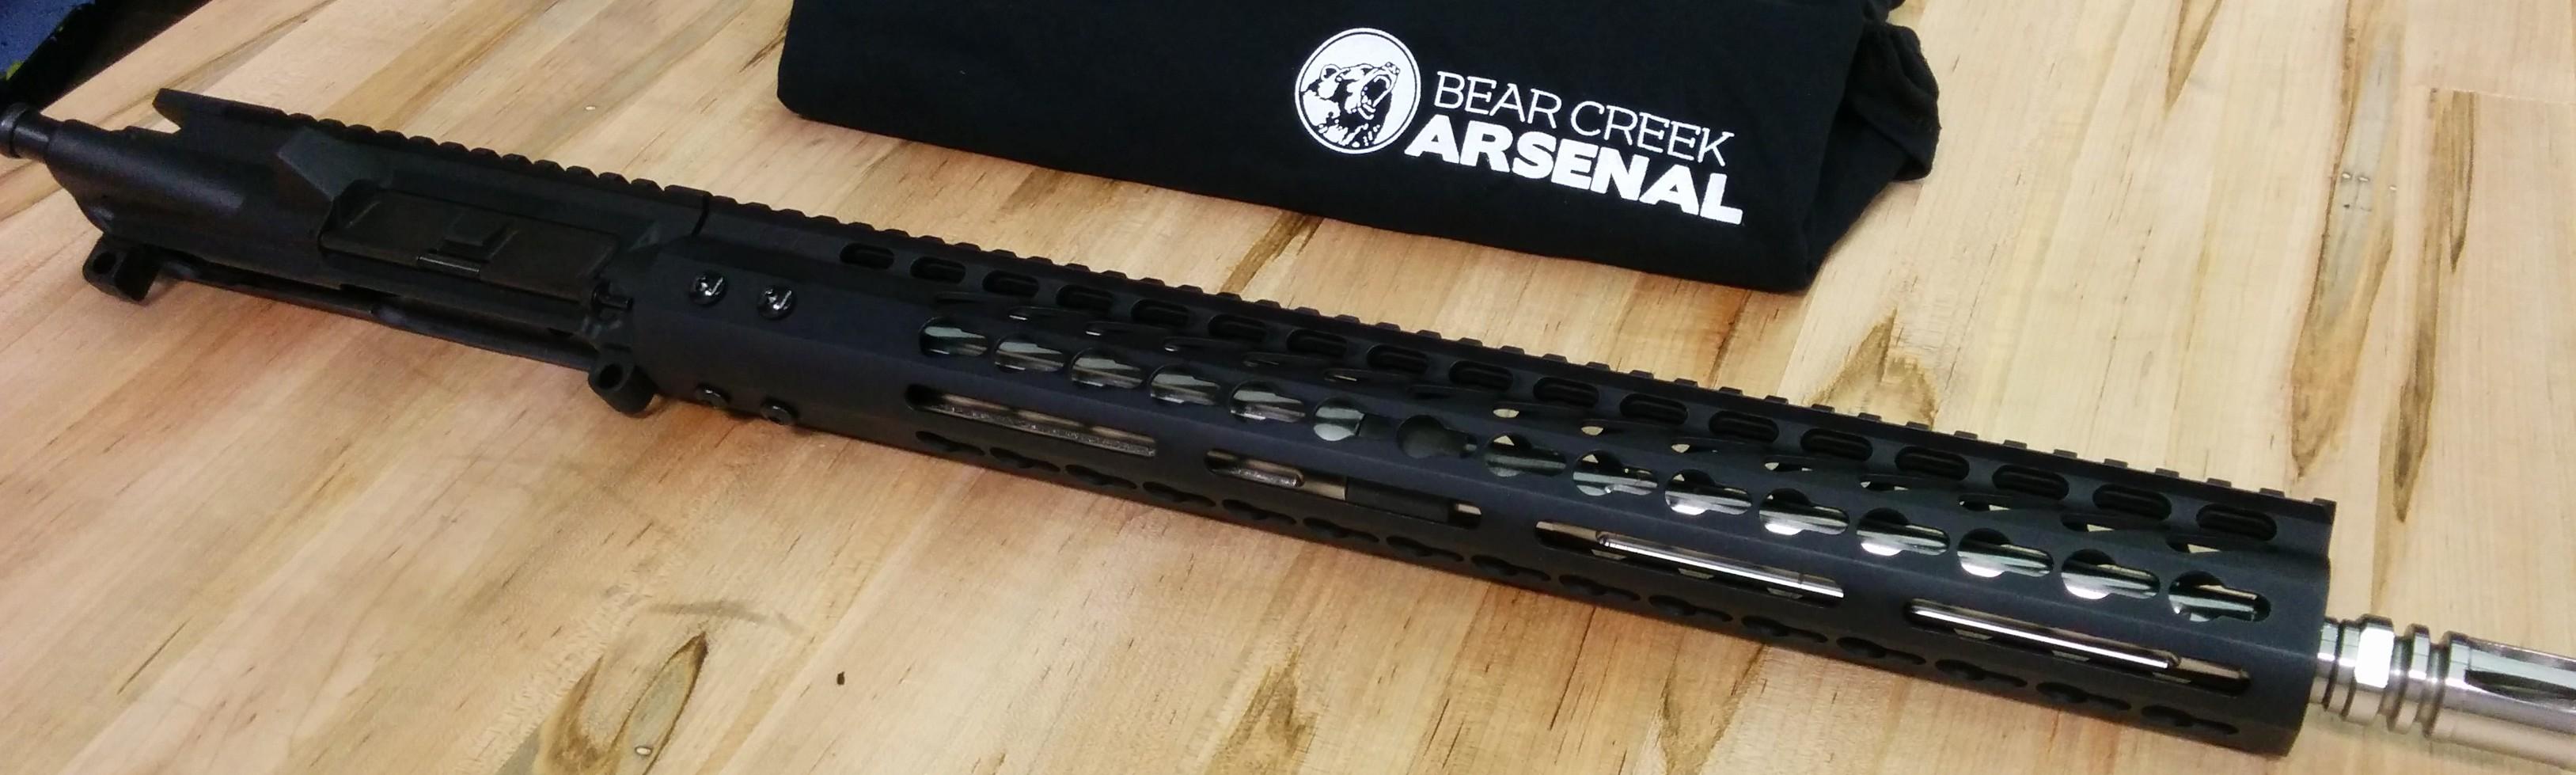 Bear Creek Arsenal Review - Gear Report Road Trip Factory Tour